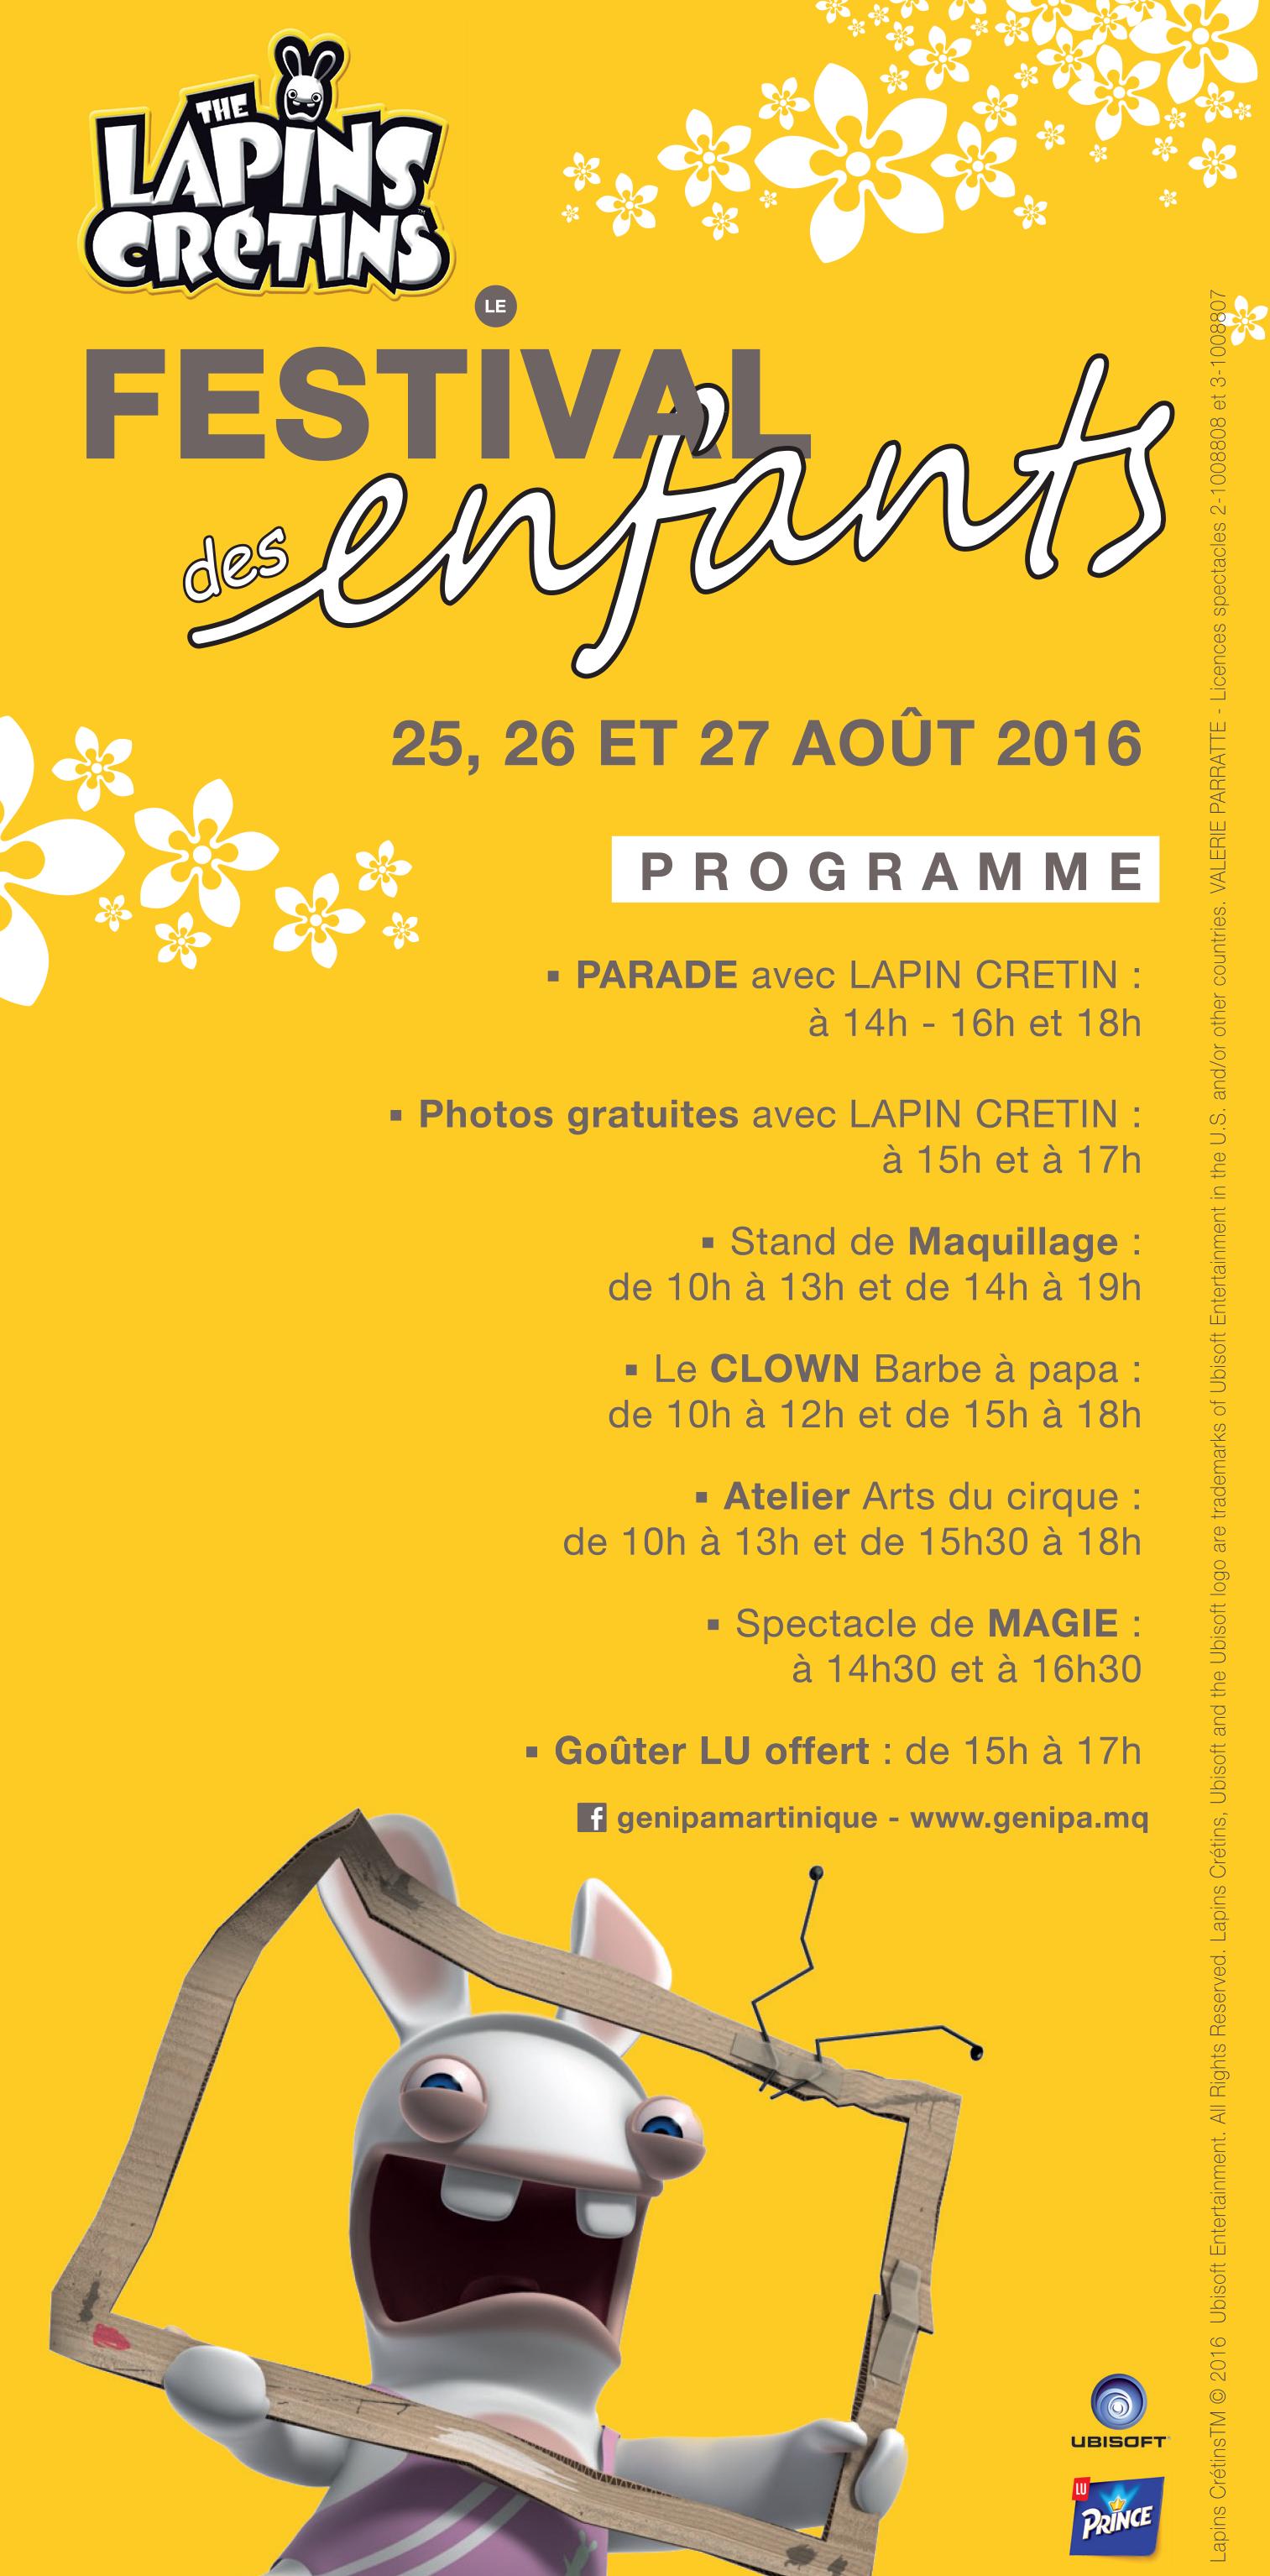 Programme Festival des enfants